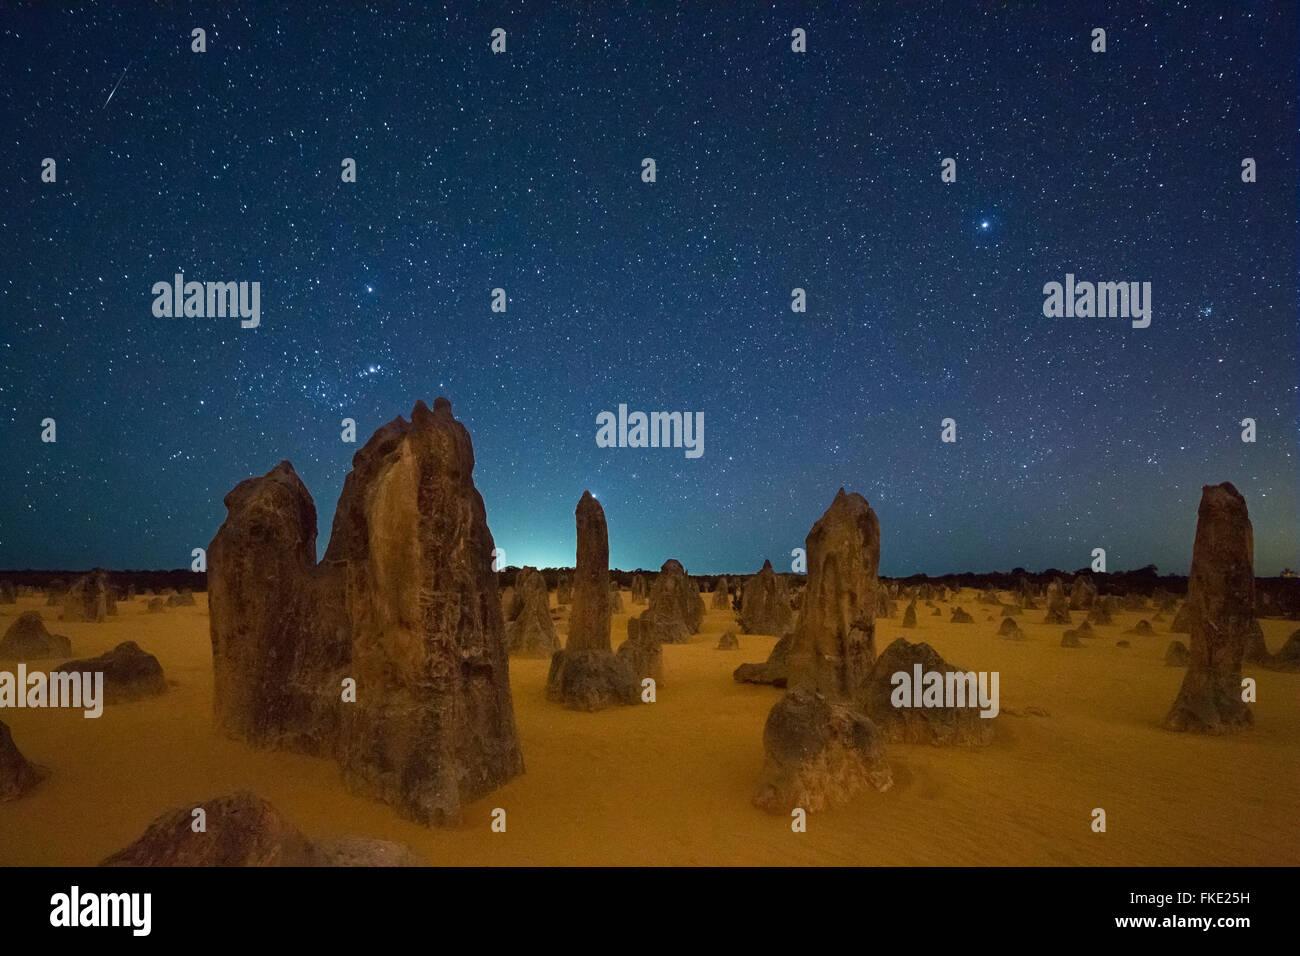 the Pinnacles at night, limestone formations, Nambung National Park, near Cervantes, Western Australia - Stock Image